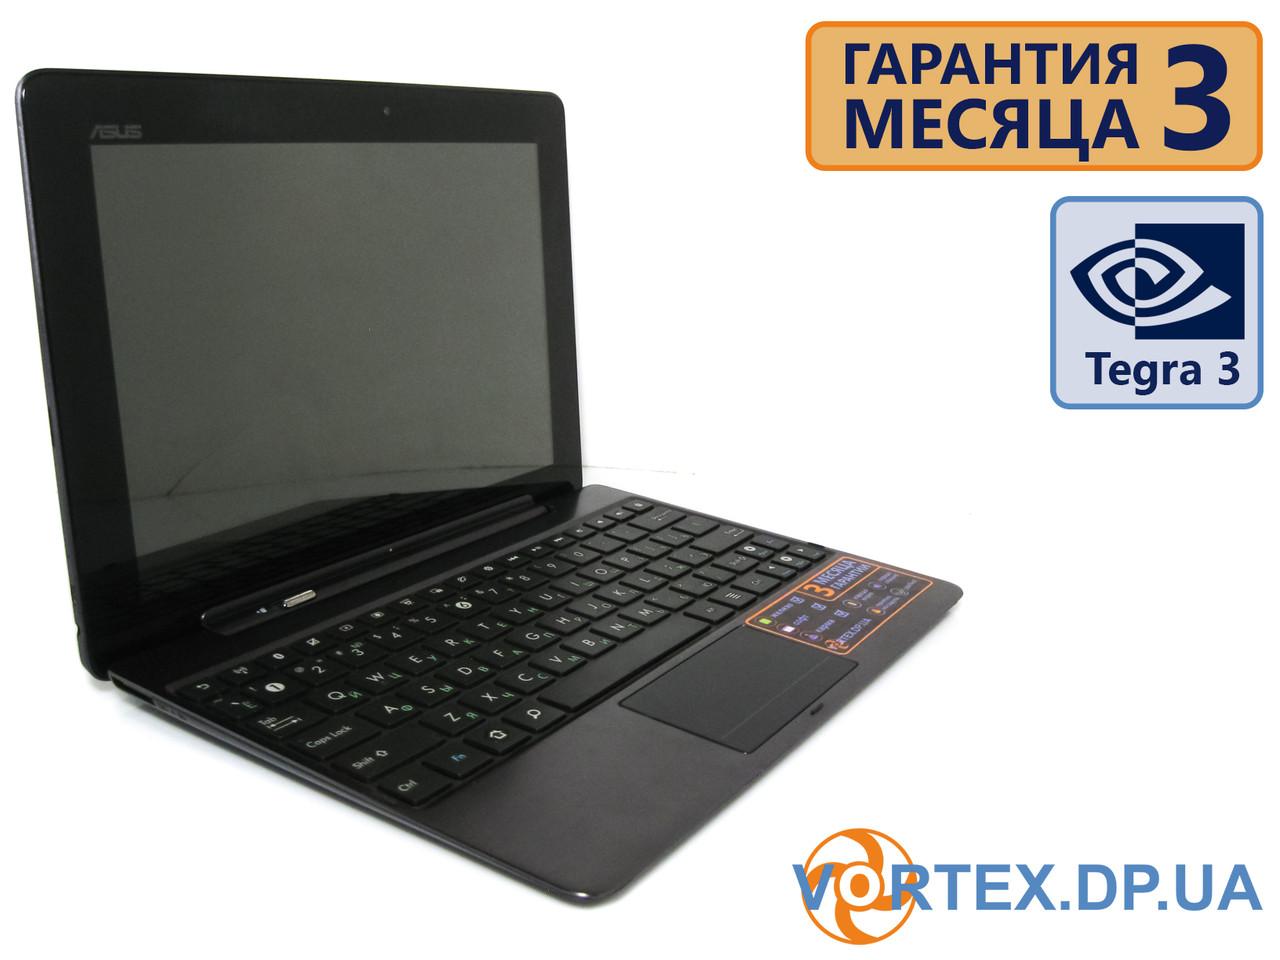 Трансформер+клавиатура Android ASUS TF700T Сенсорный 10.1 IPS (1920х12